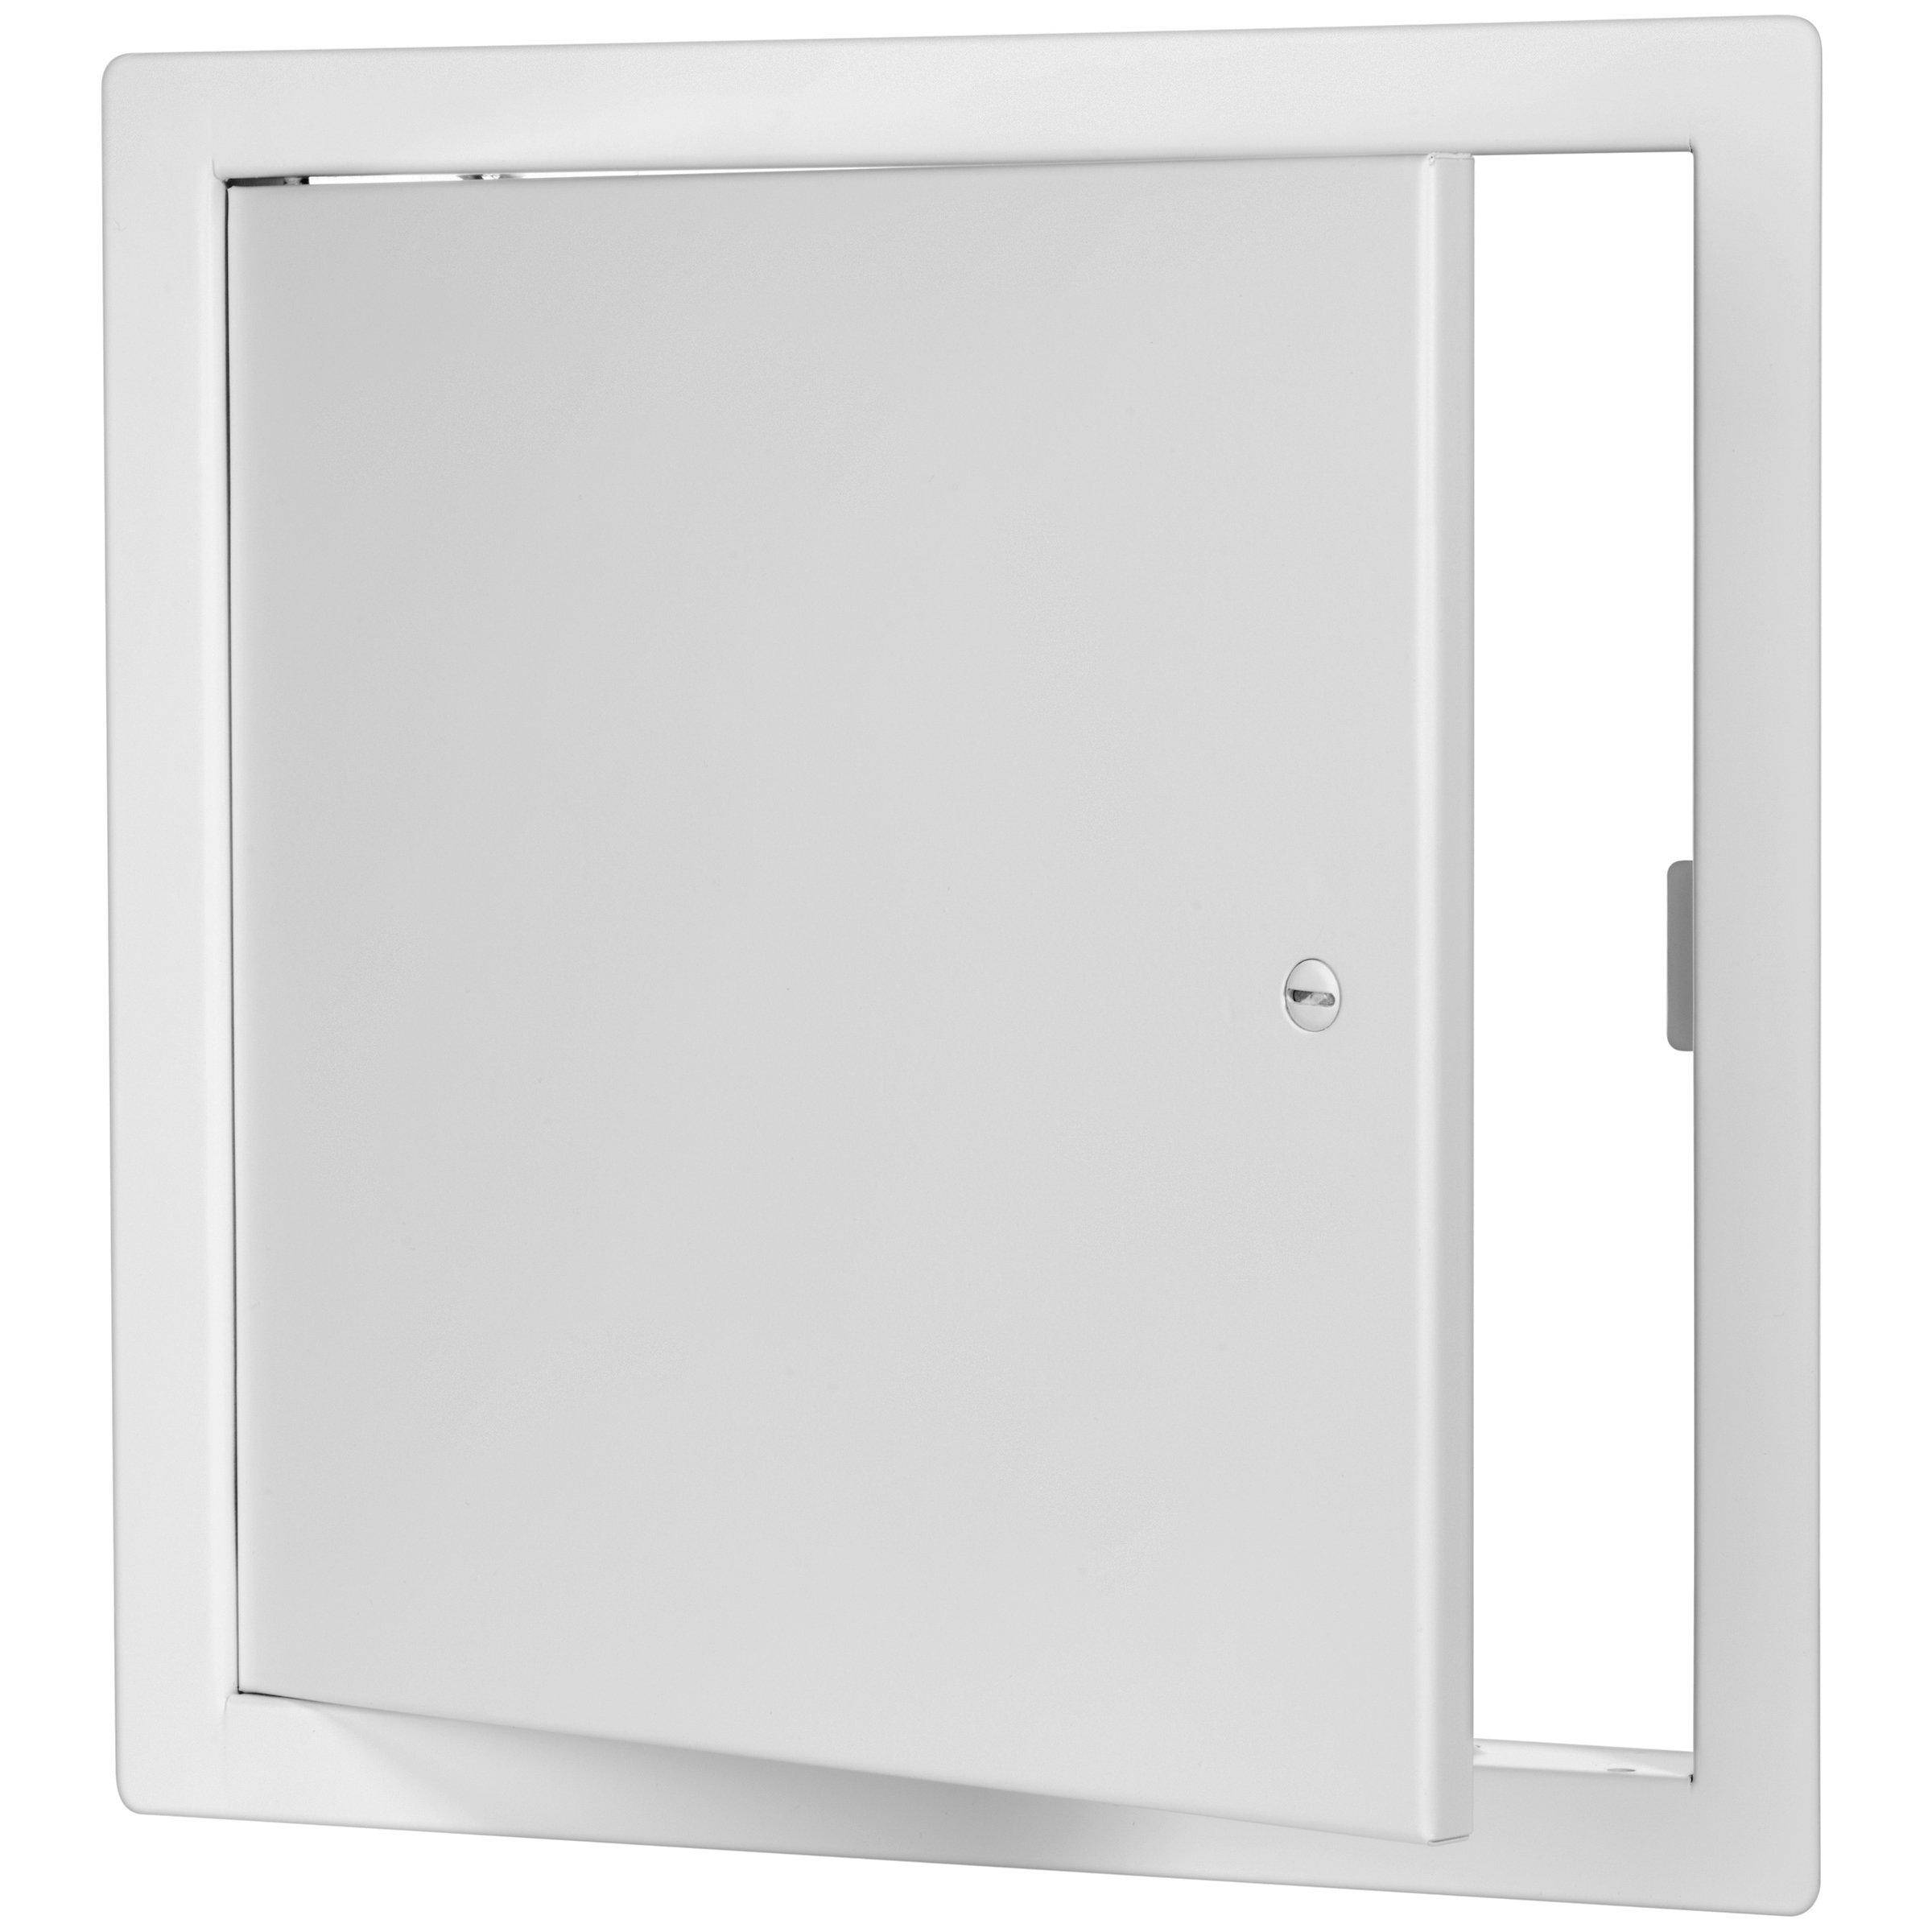 Premier 2002 Series Steel Access Door, 10 x 10 Flush Universal Mount, White (Screwdriver Latch)